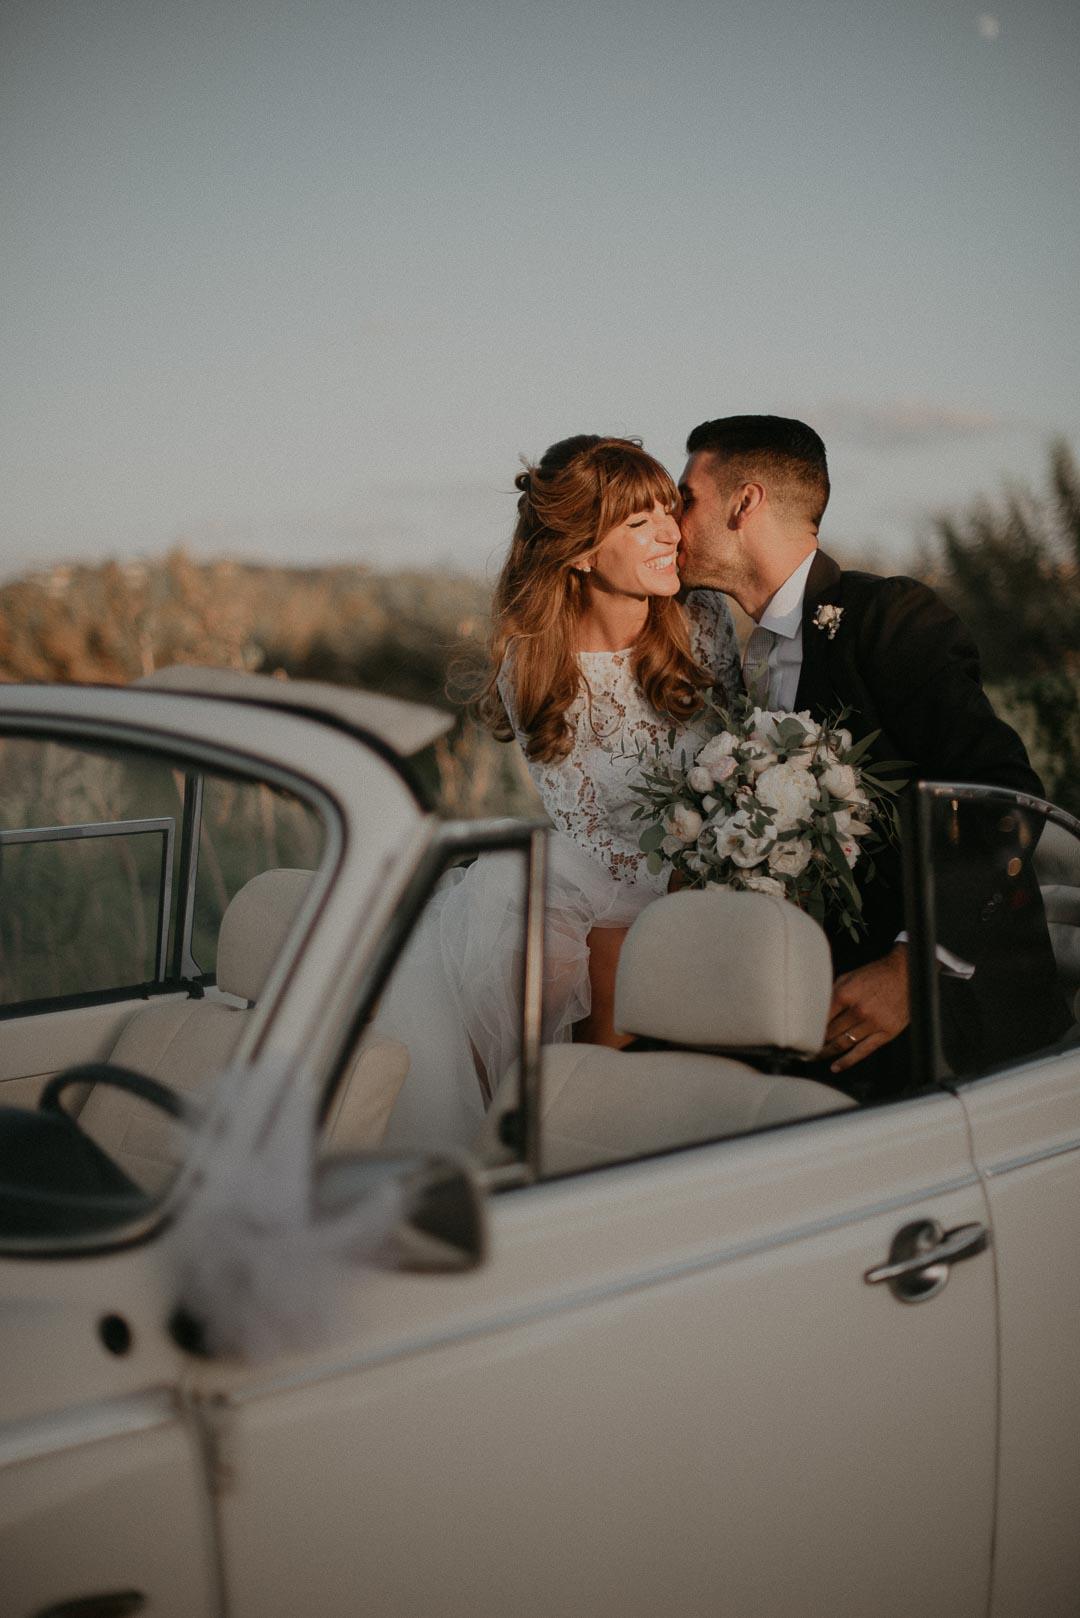 wedding-photographer-destination-fineart-bespoke-reportage-napoli-nabilah-vivianeizzo-spazio46-90